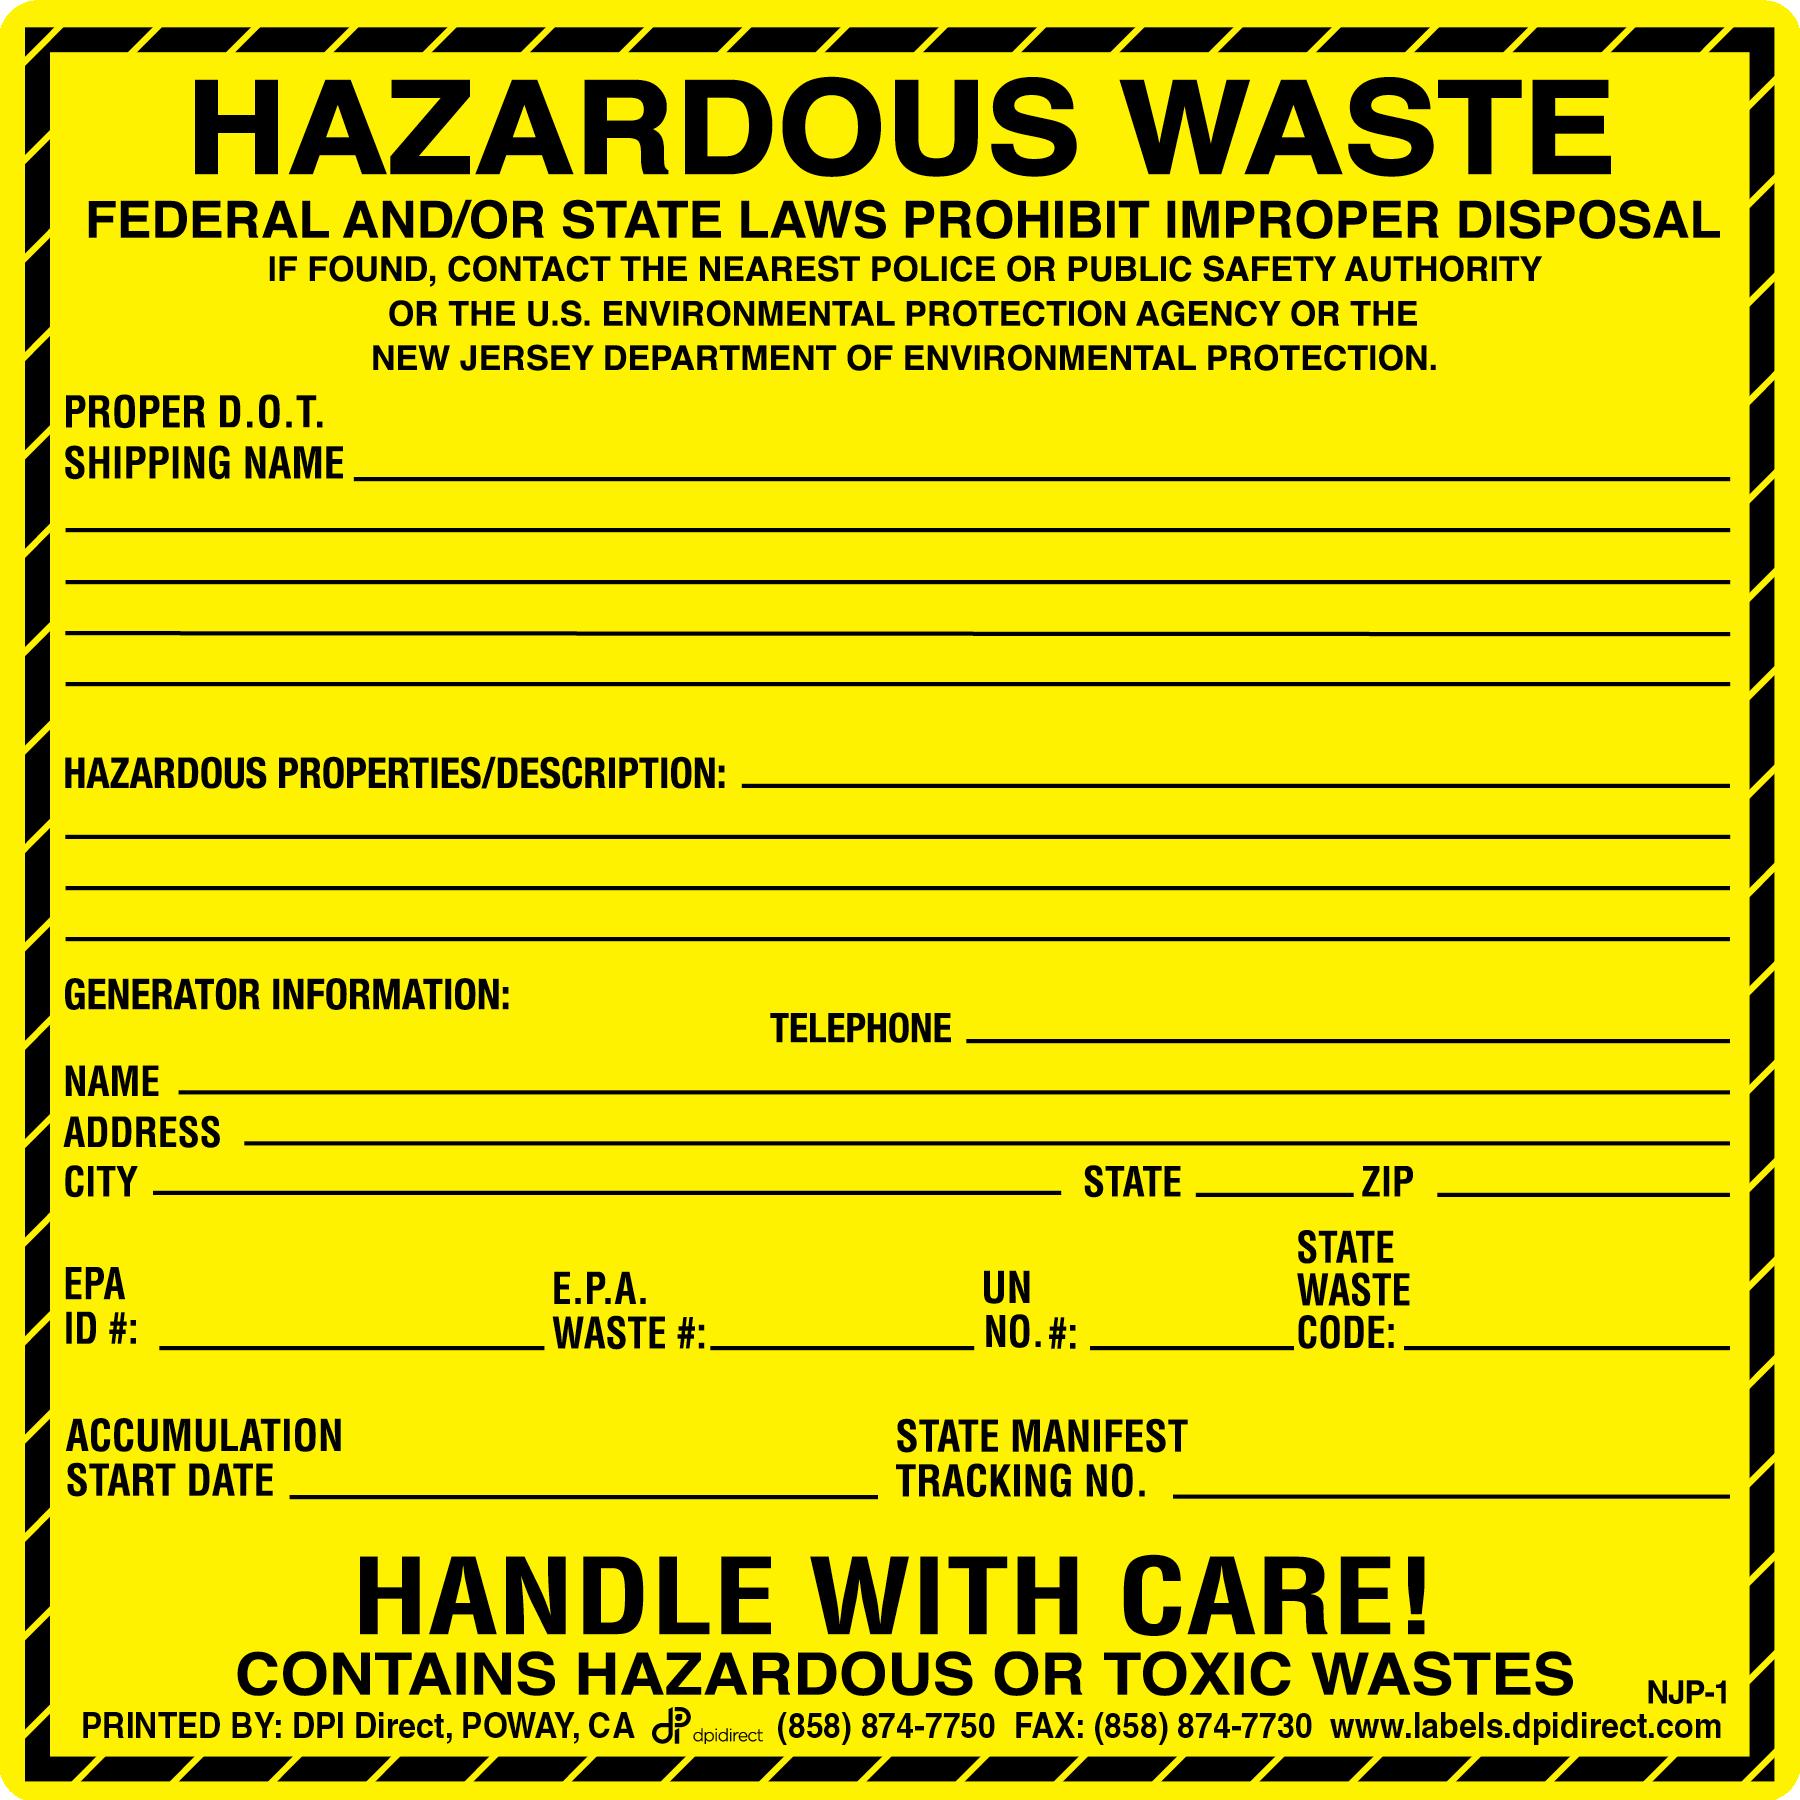 Hazardous Waste Label Template Resume health and wellness director ...